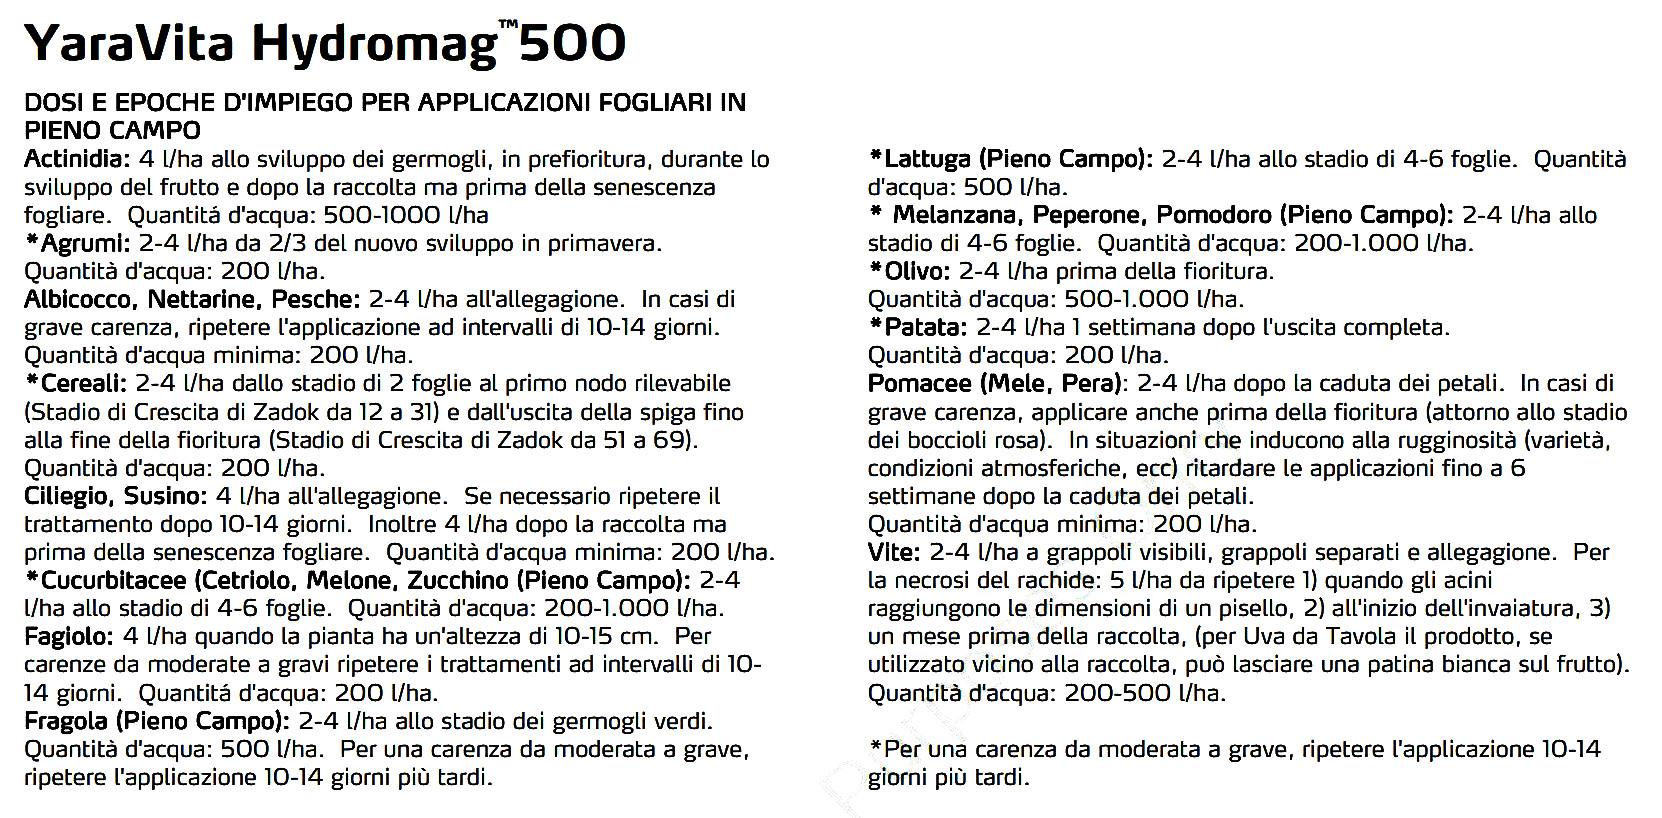 hydromag-500 impiego